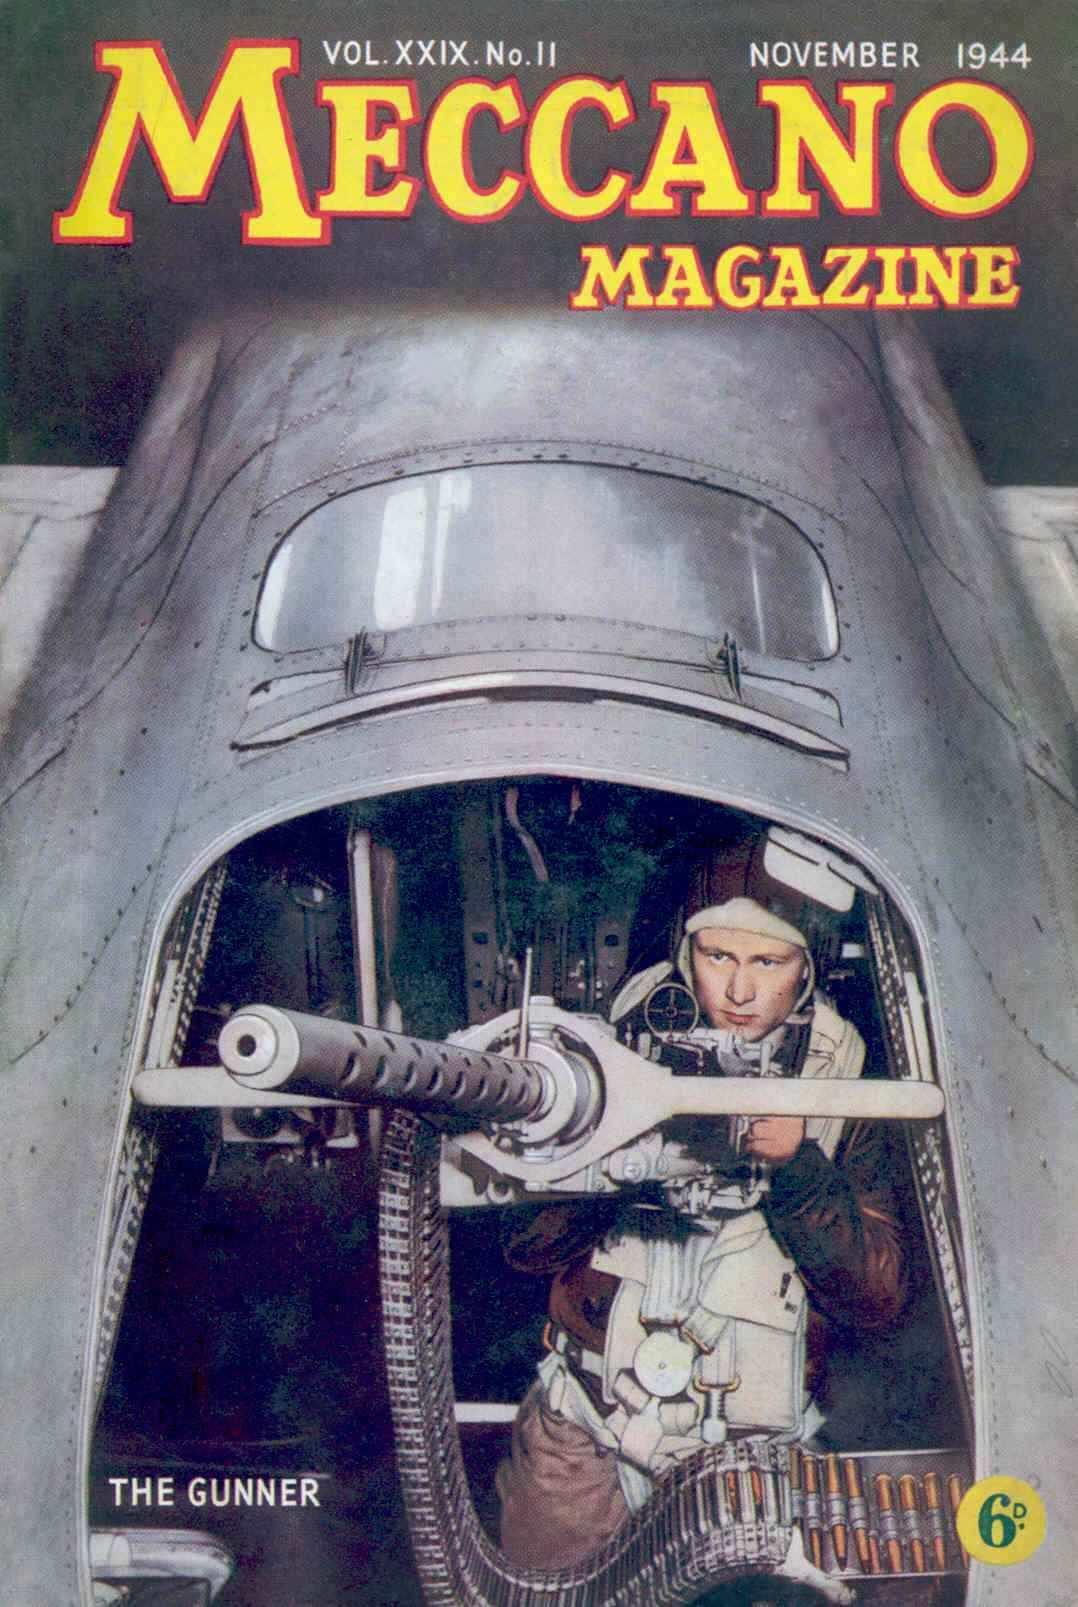 UK Meccano Magazine November 1944 Front cover